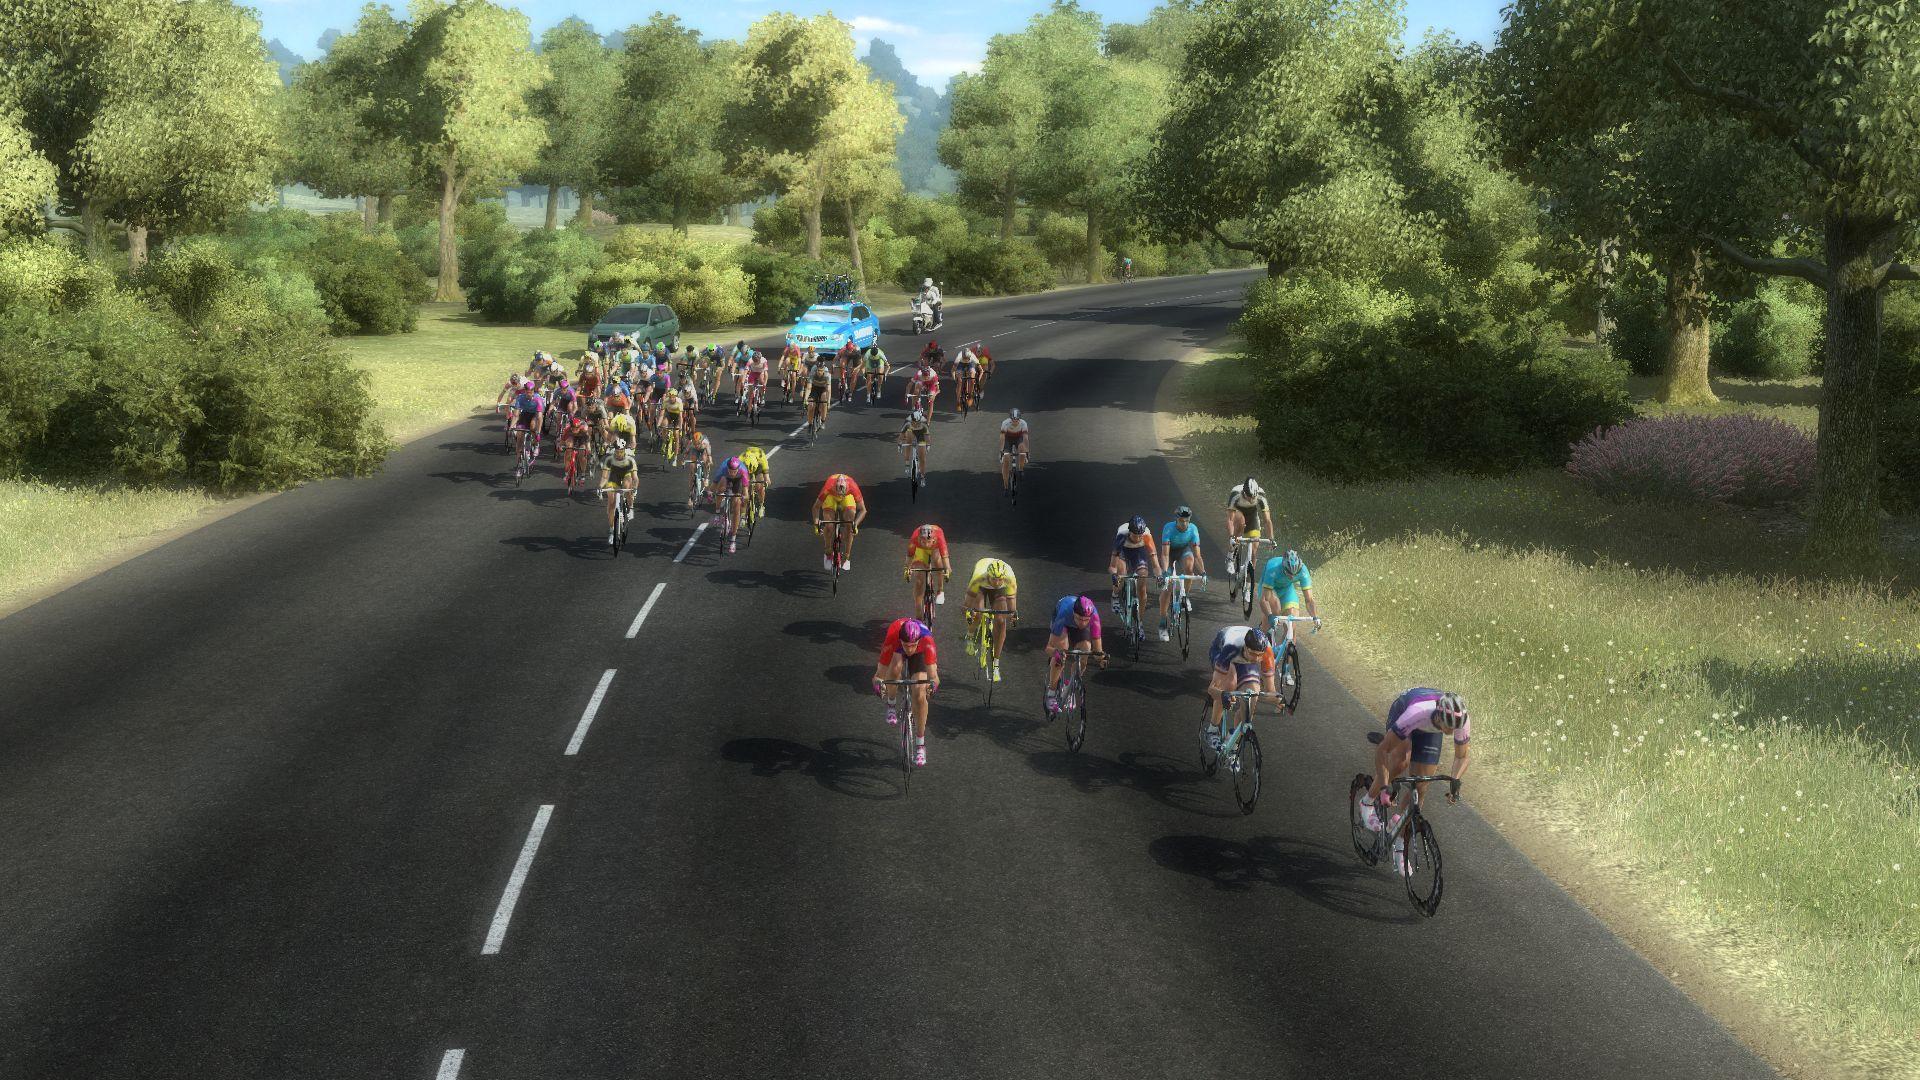 pcmdaily.com/images/mg/2020/Reports/GTM/Giro/S06/mg20_giro_s06_39.jpg